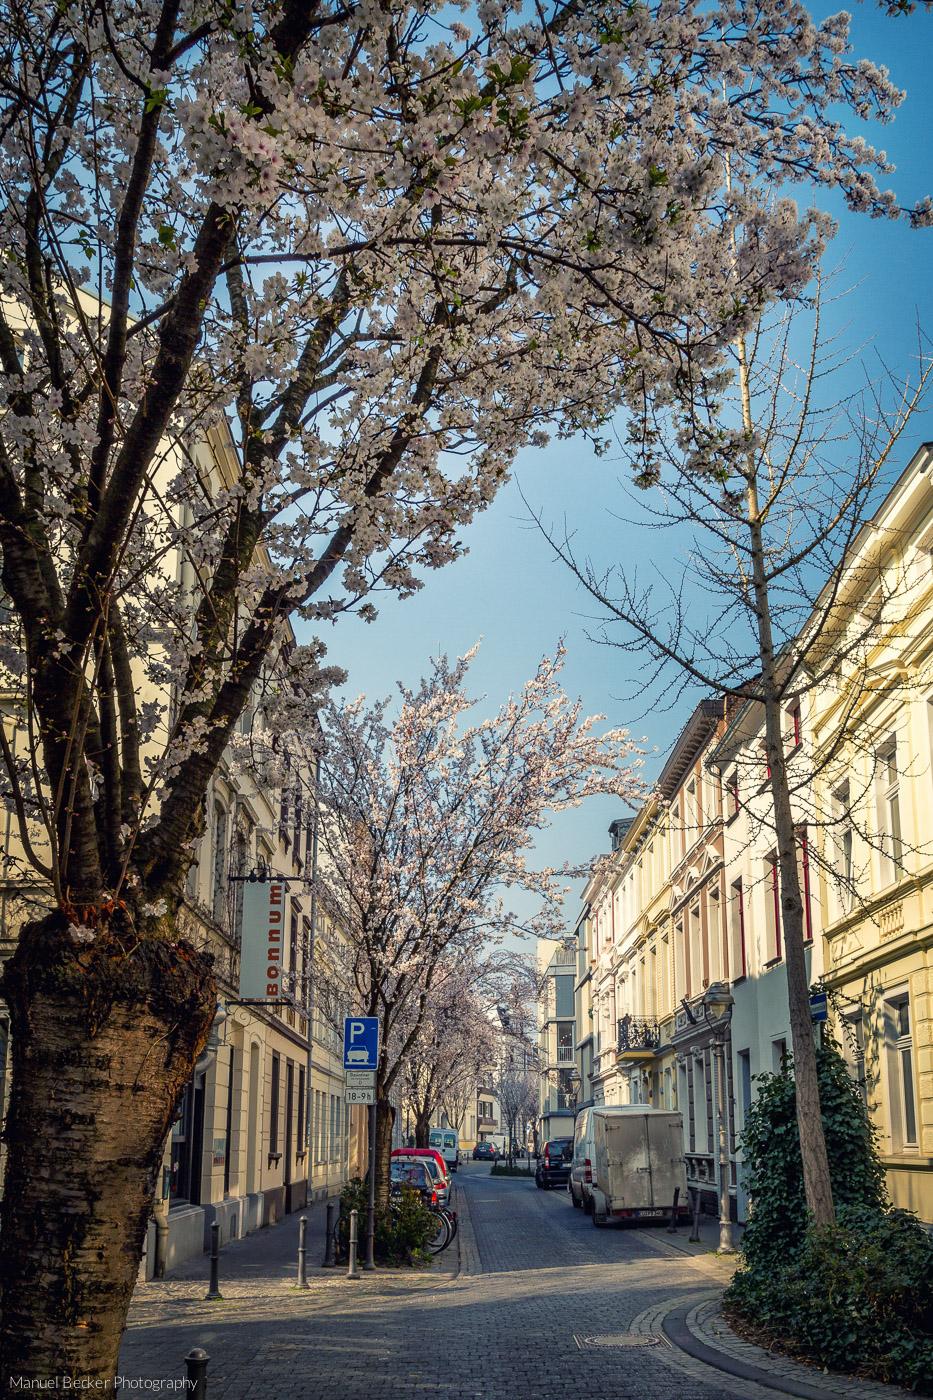 Beginning of cherry tree blooming period, Bonn, Germany